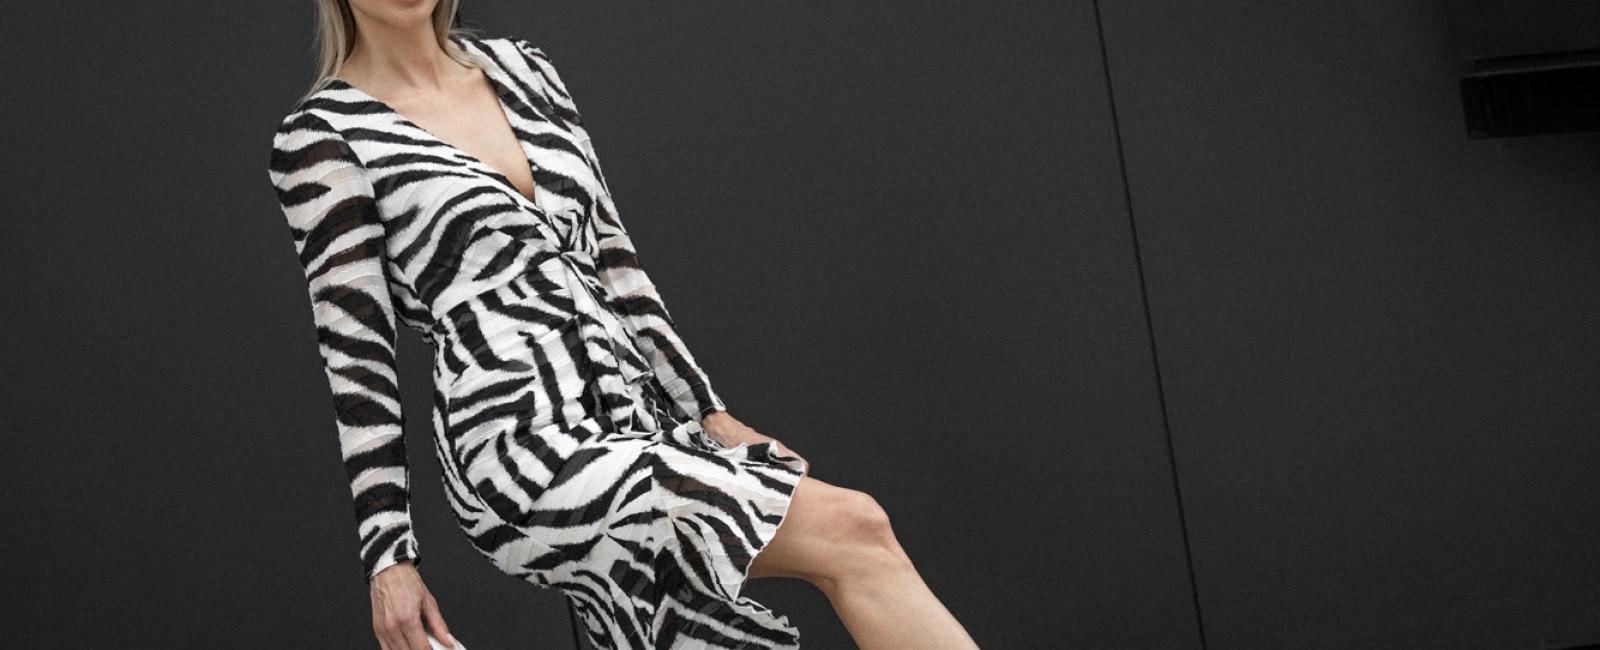 MOD-by-Monique-Fashion-Looks-Zebra-Dress-Lipsy-London-06